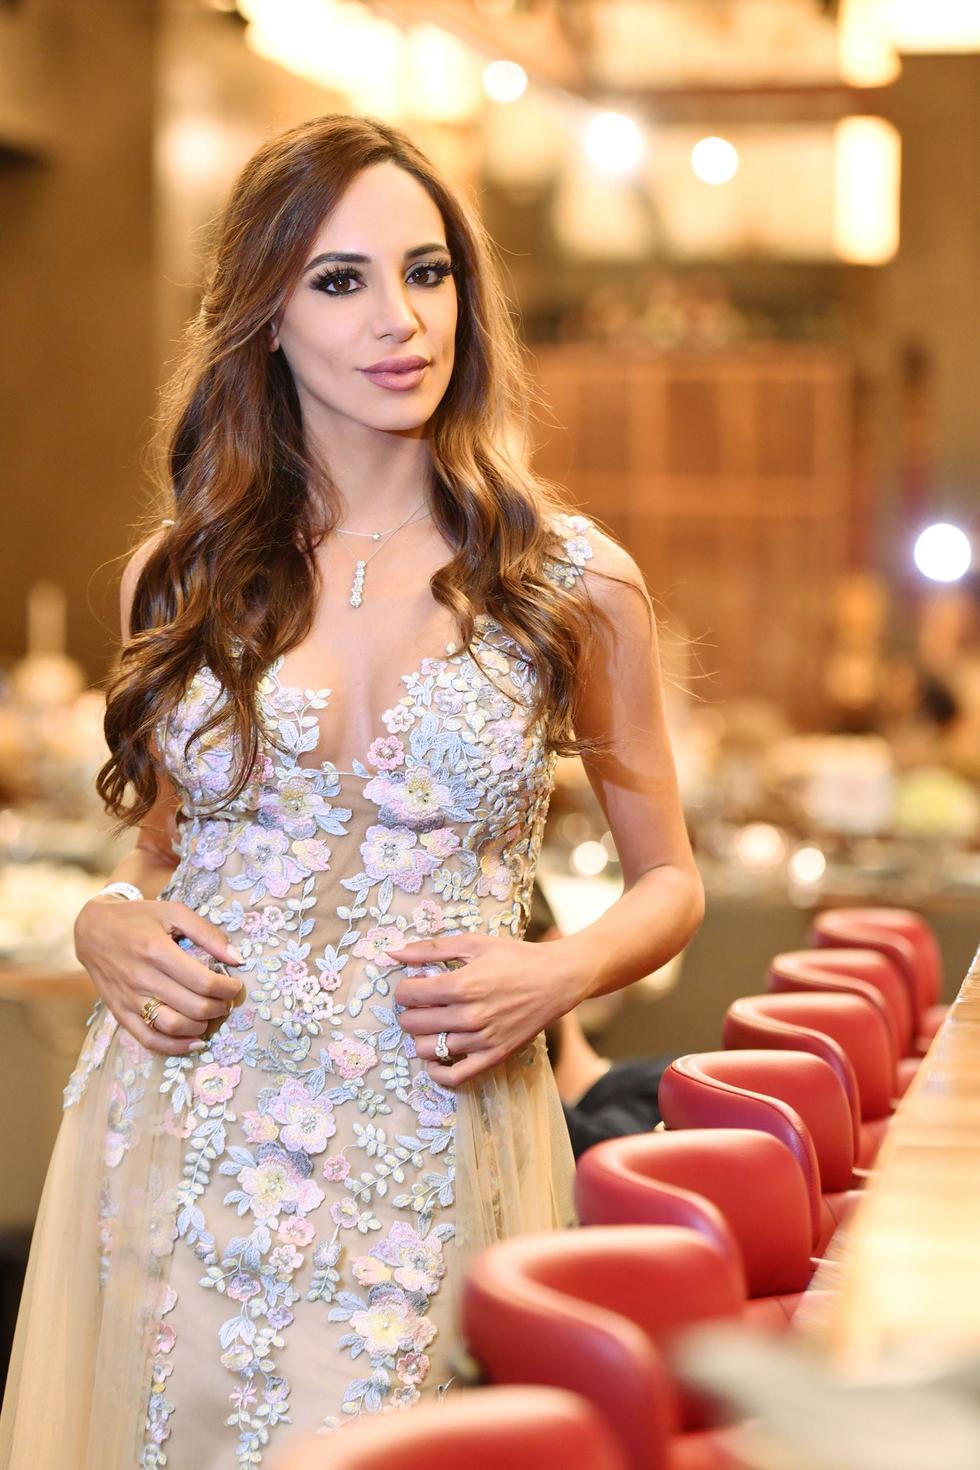 Blogger, Fashion pirate, Wedding, Wedding season, Engagement, Real life, Love story, LEbanon, Katb el-Kitab